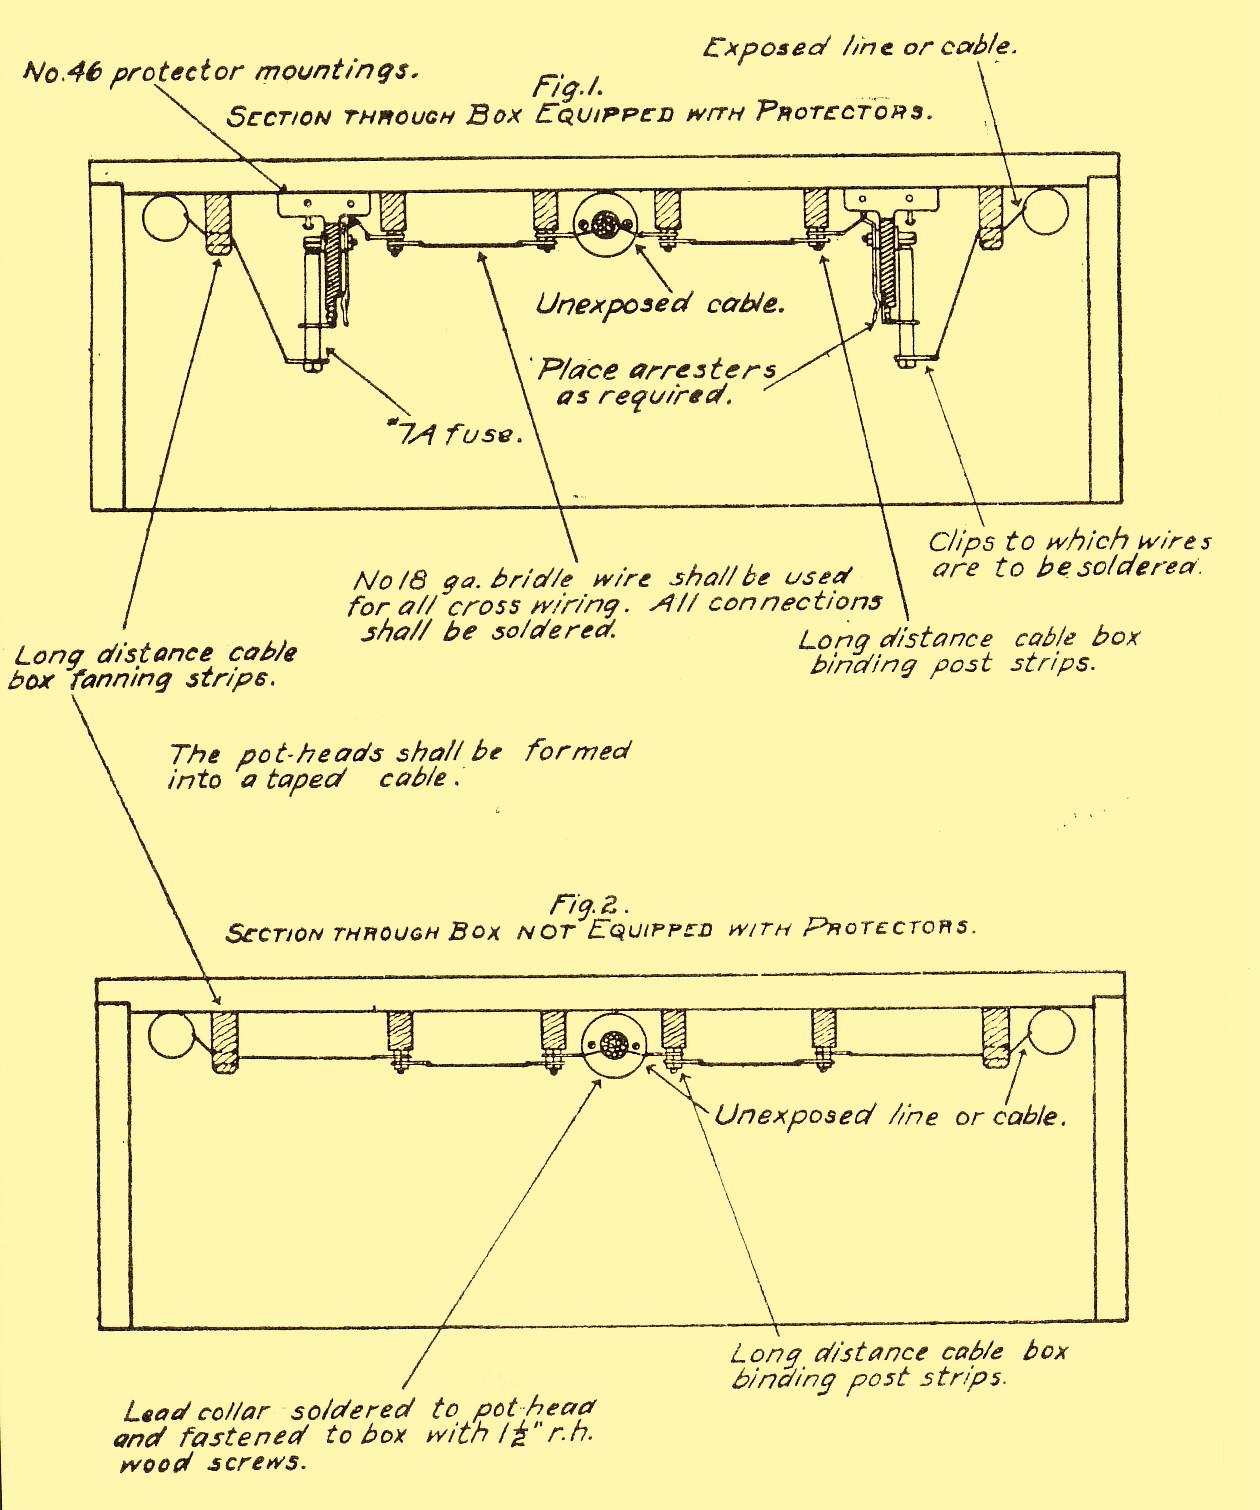 distributing-box-interior-profile-of-equipment-placement